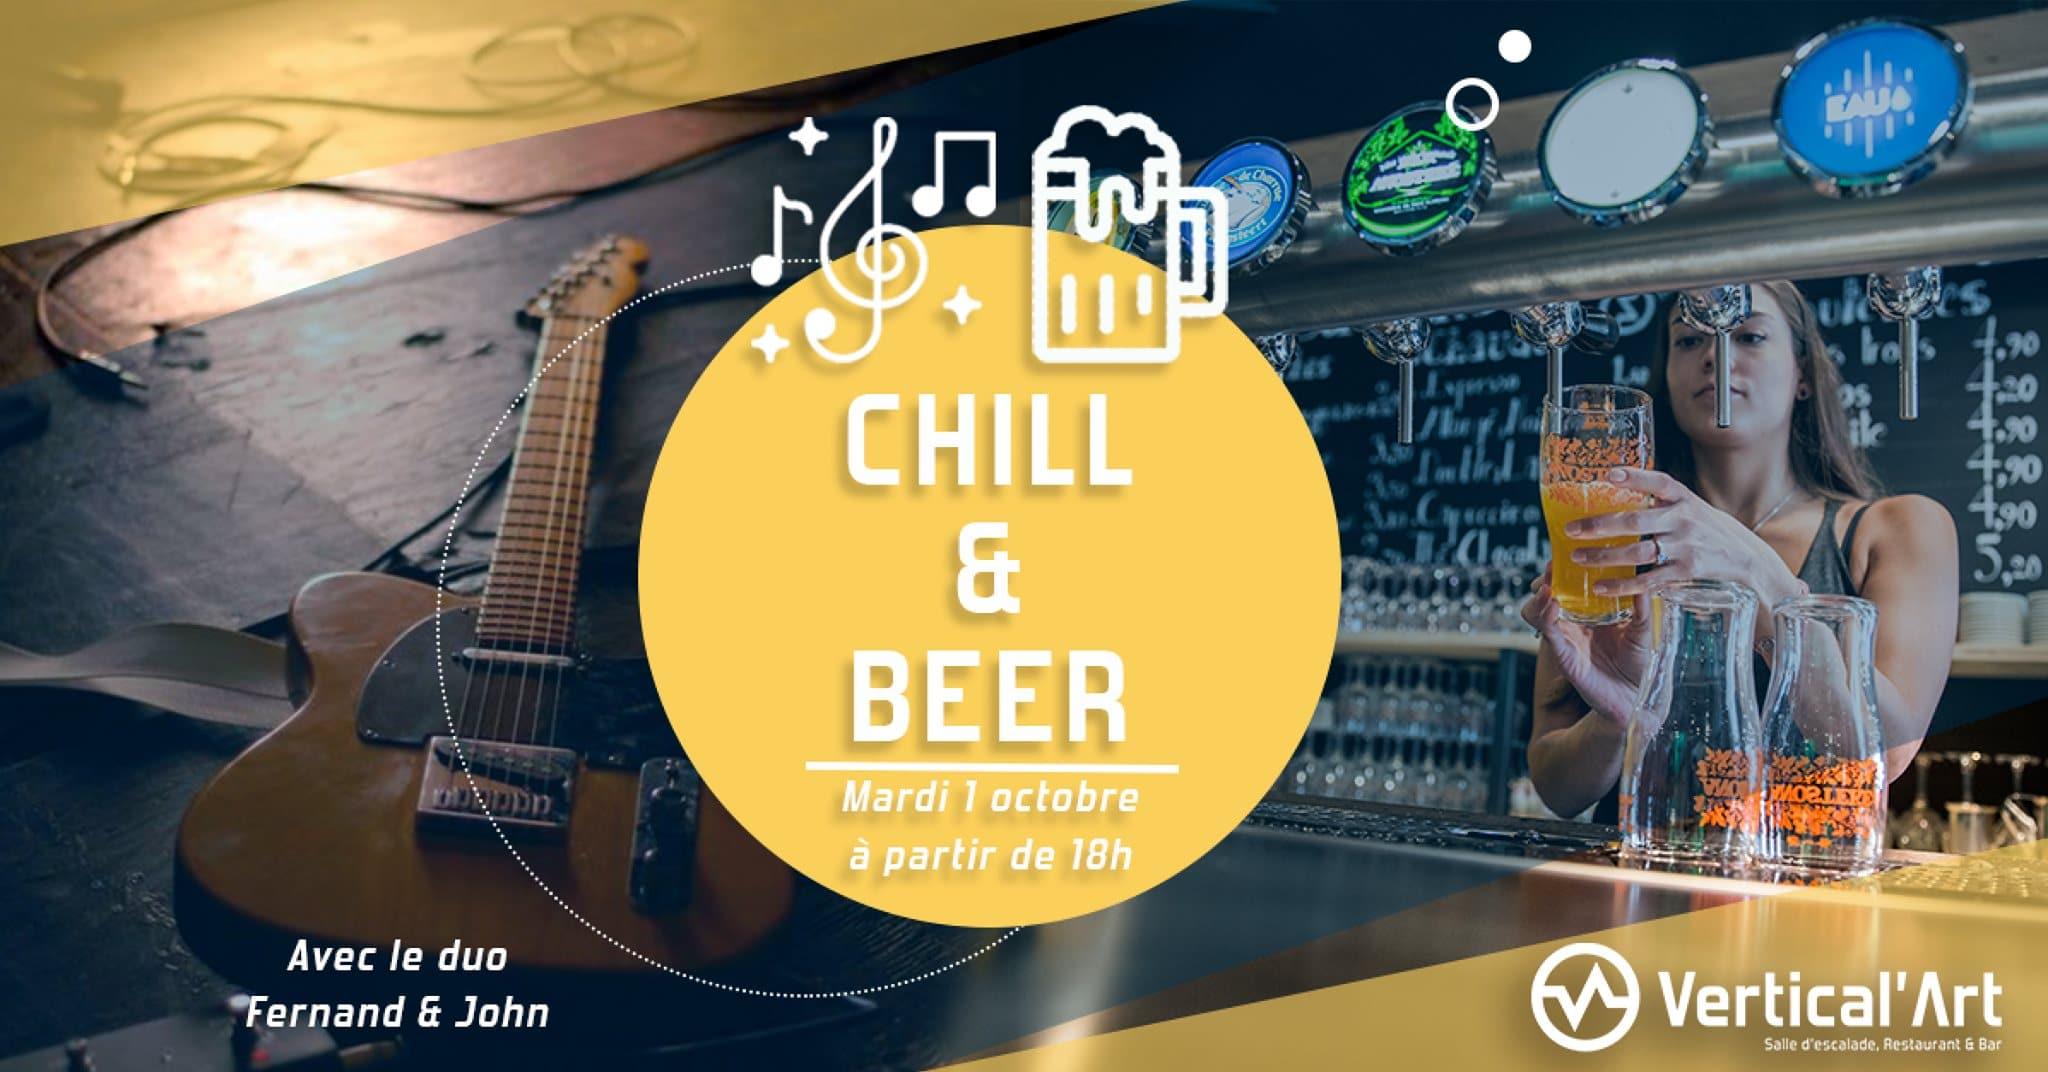 chill & beer - saison - Vertical'Art saint-quentin-en-yvelines - salle d'escalade - restaurant - bar - concert - bières